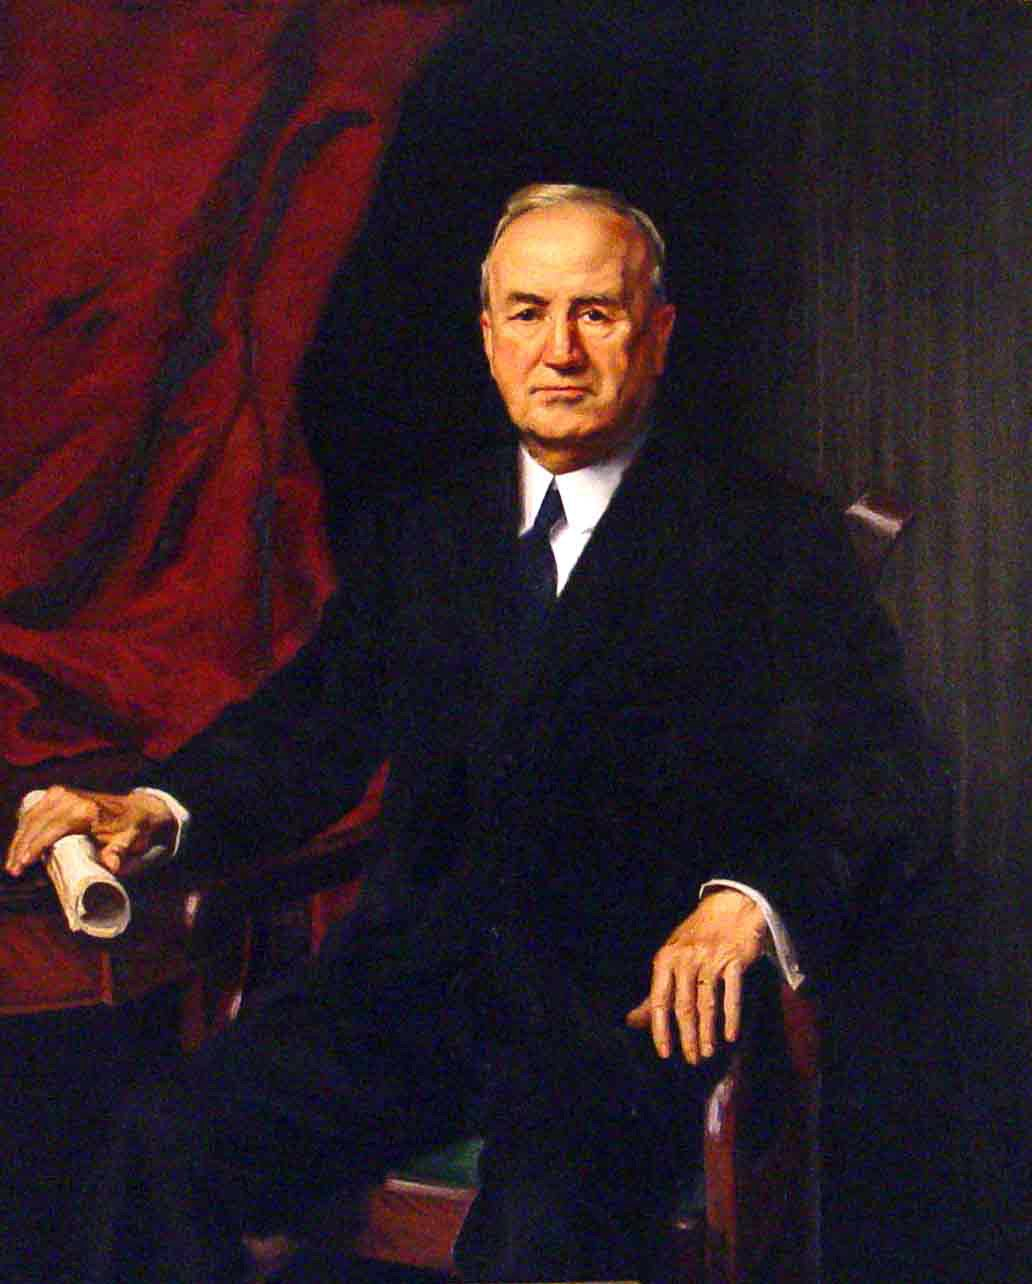 On this day in Alabama history: Thomas E  Kilby was born